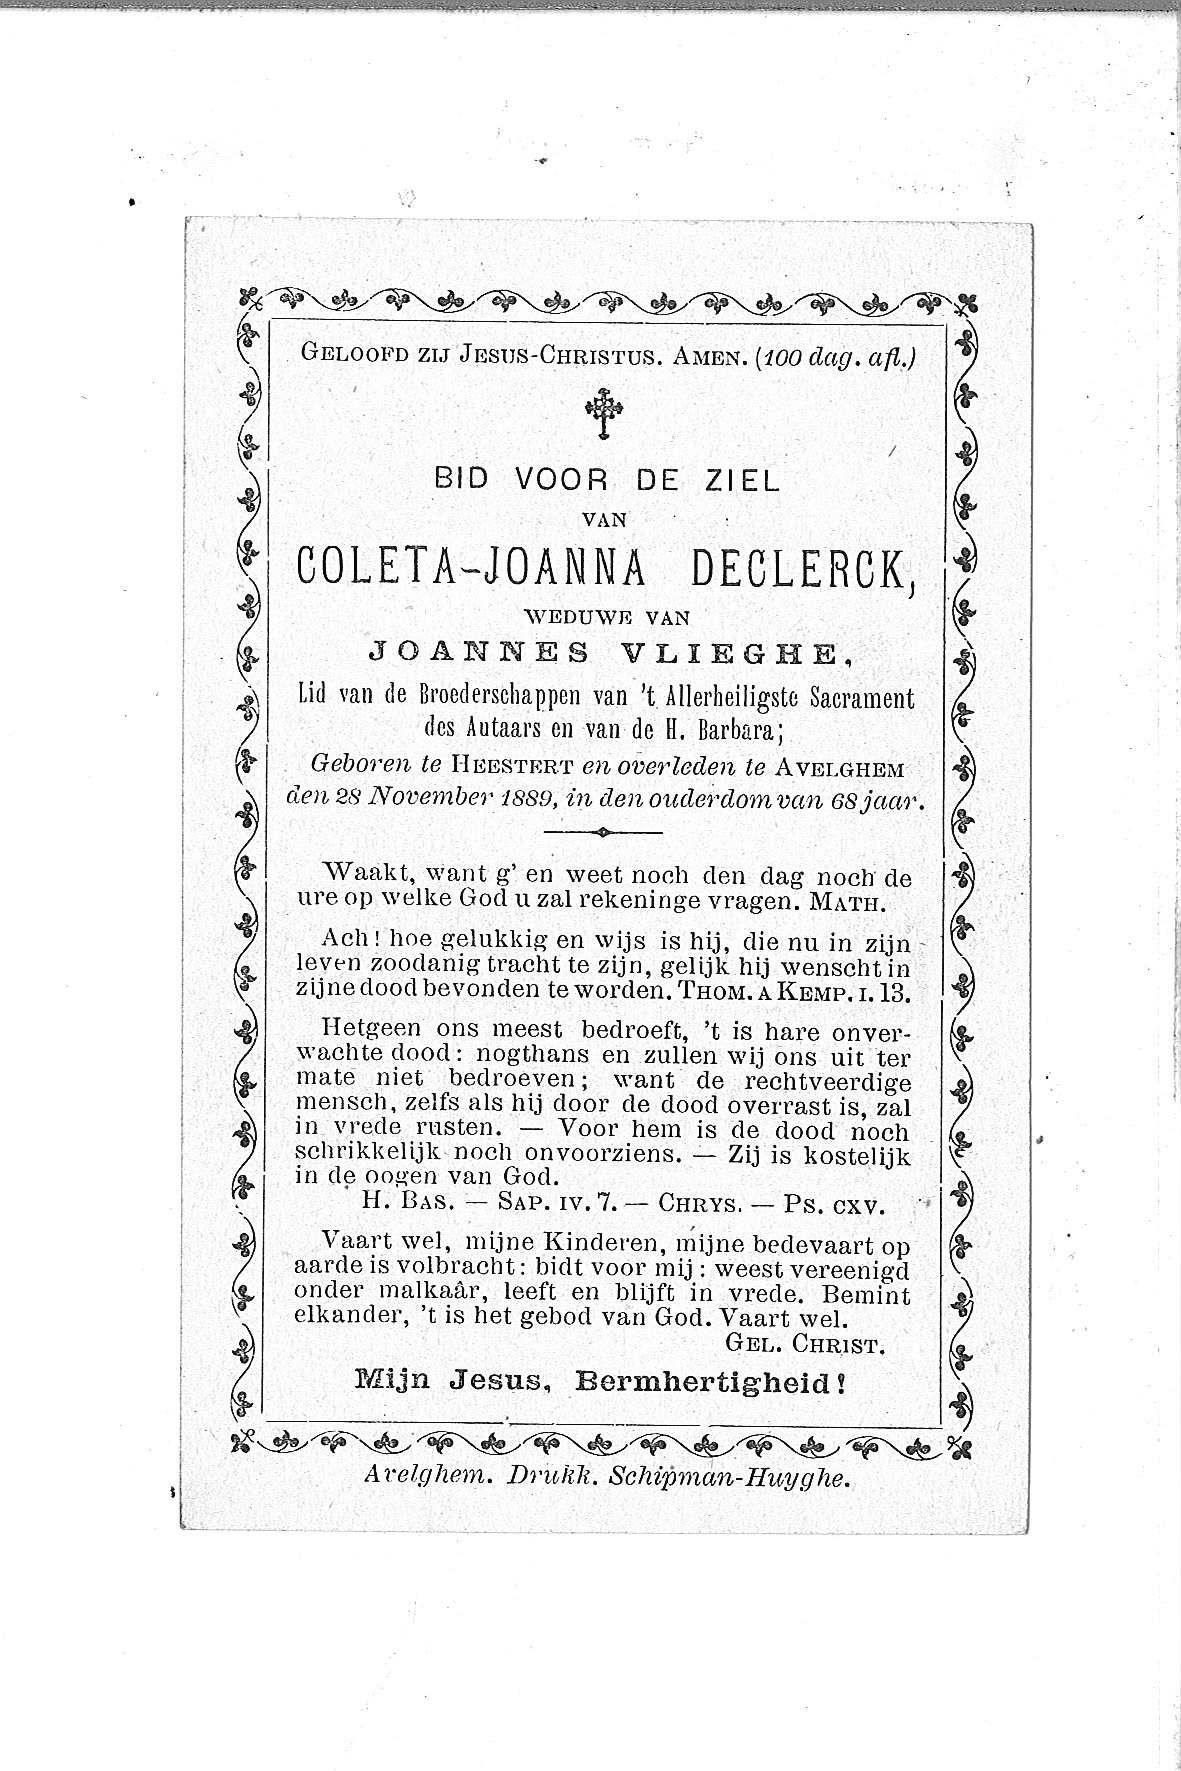 coleta-joanna(1889).jpg